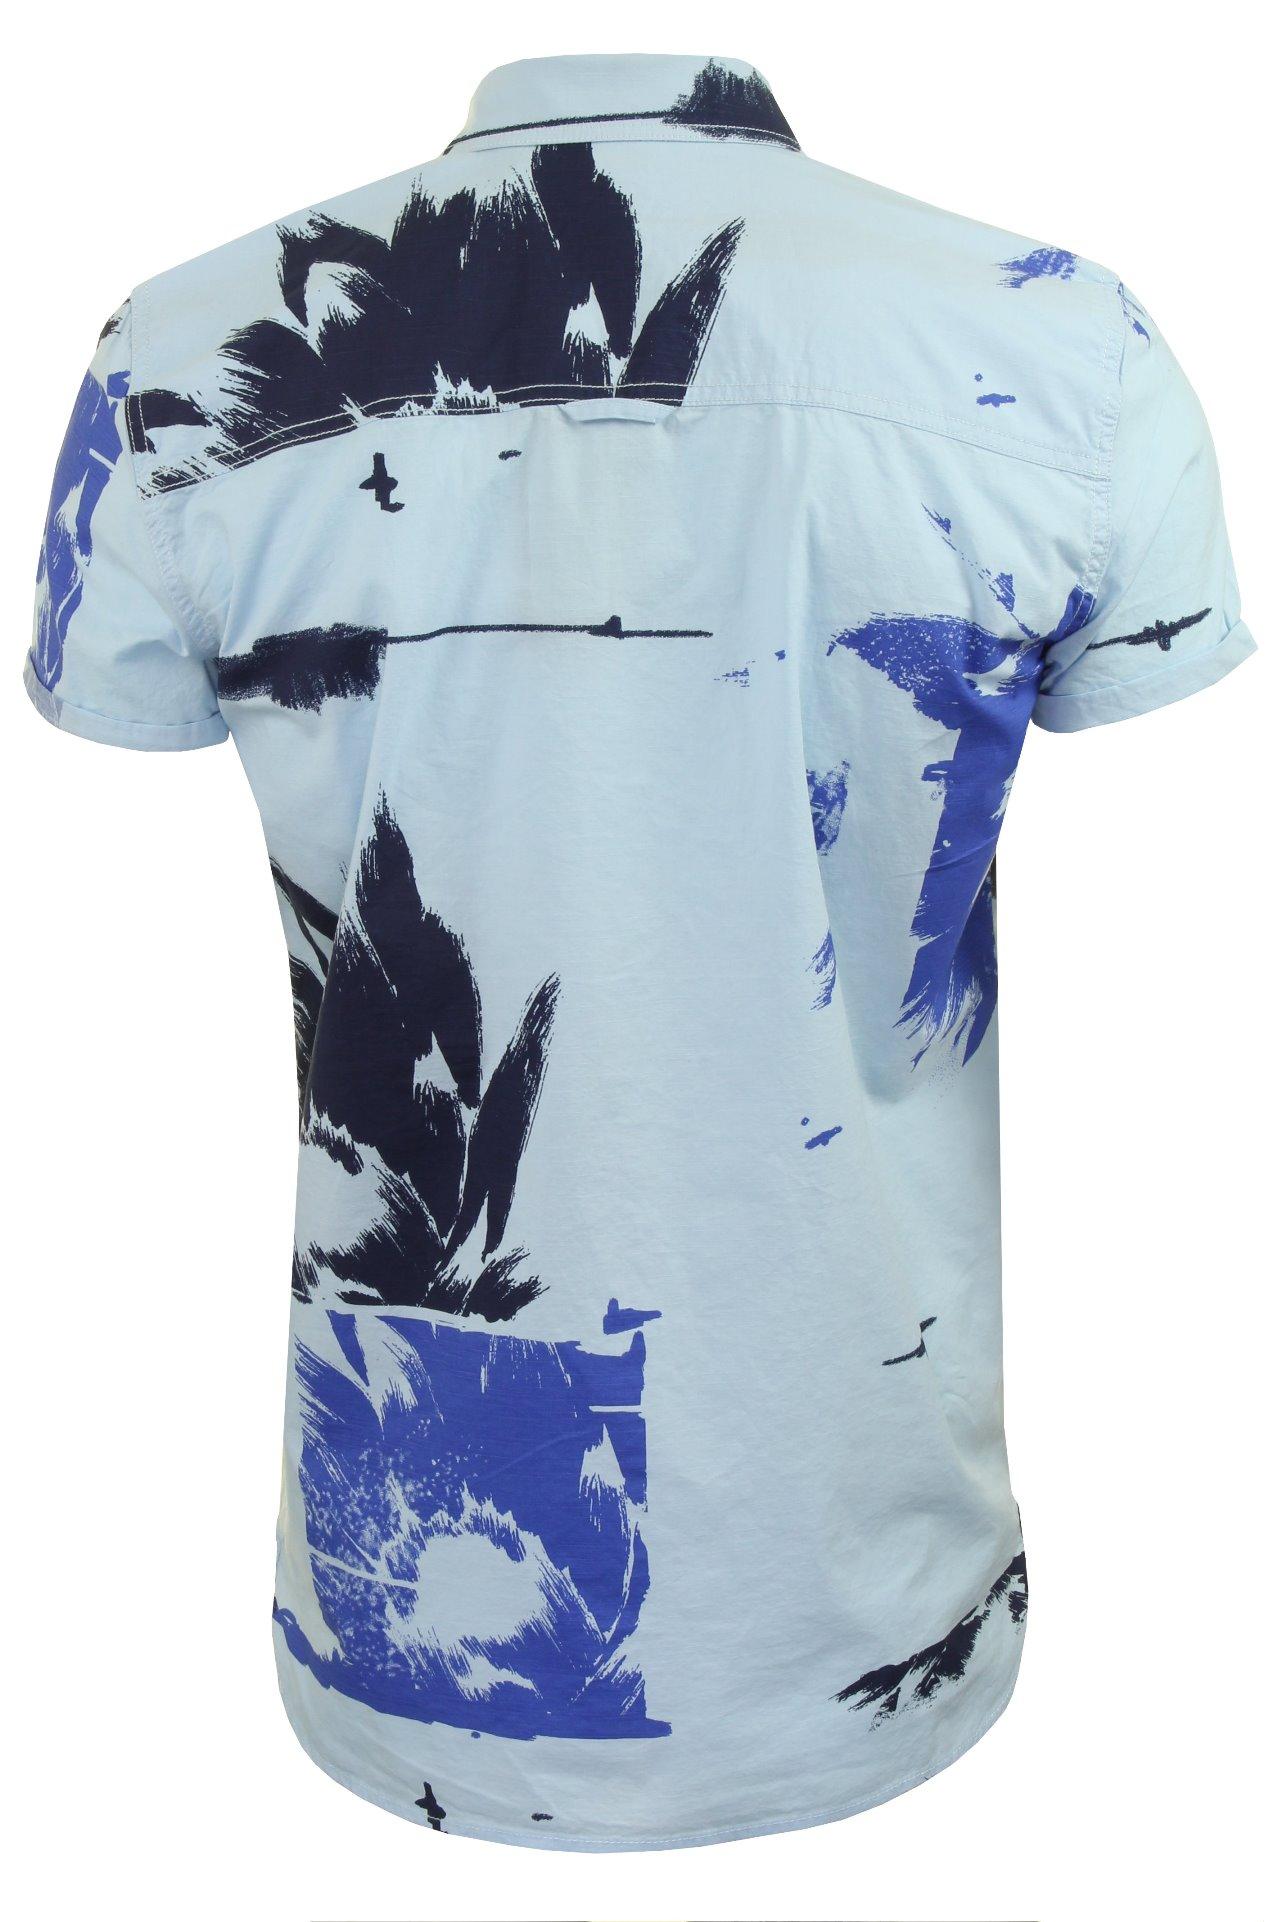 O'Neill Mens Hawaiian Hawaiian Hawaiian Floral Shirt    Exquisite (mittlere) Verarbeitung  82698f